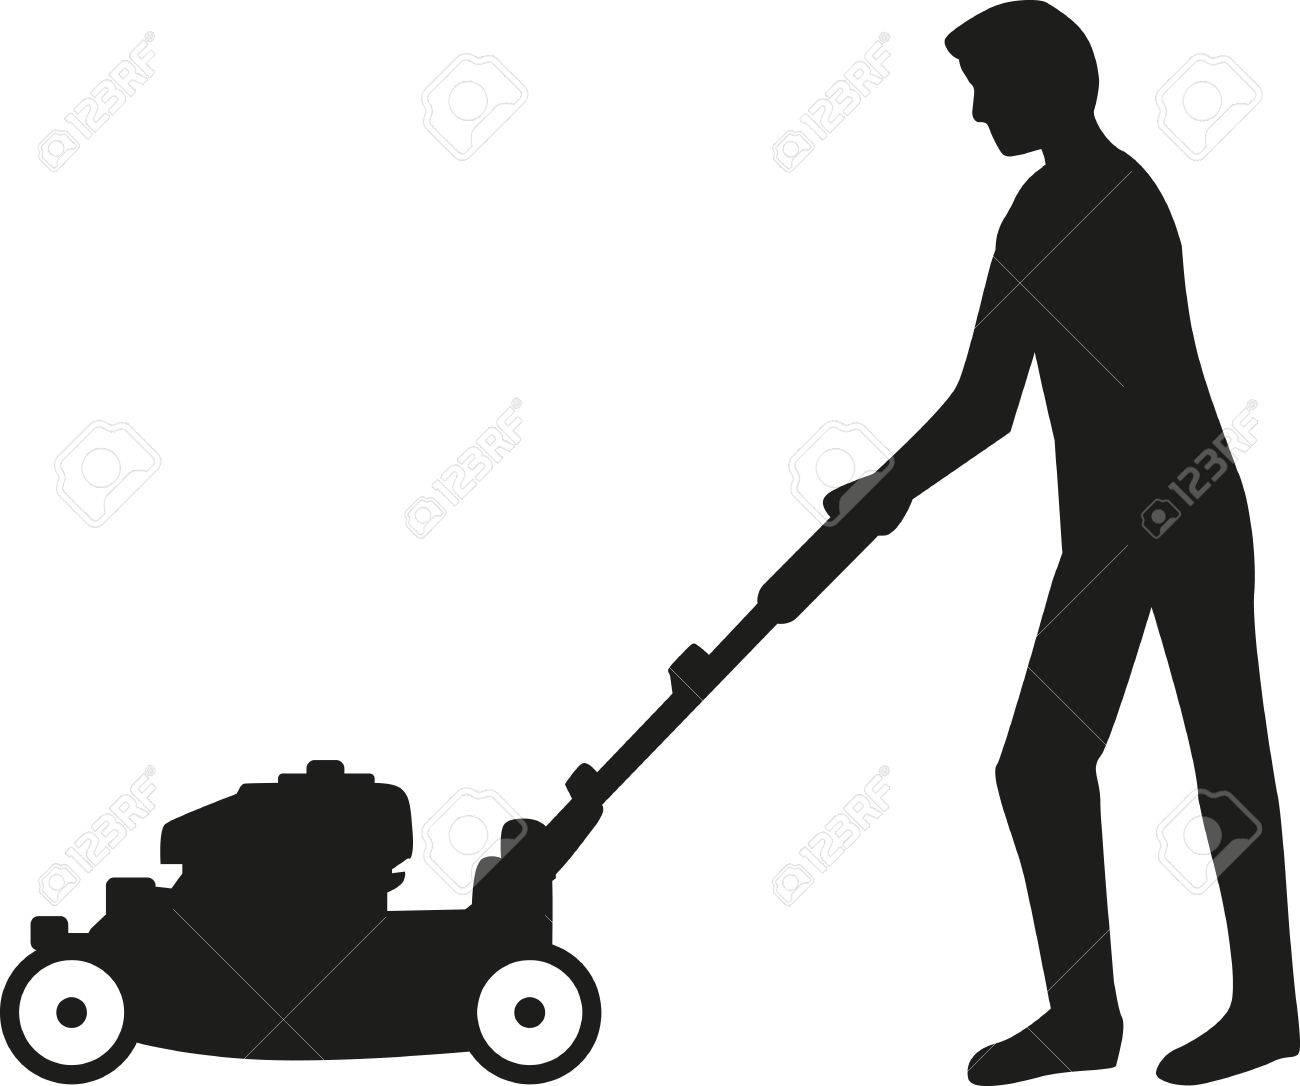 Man using lawn mower silhouette.